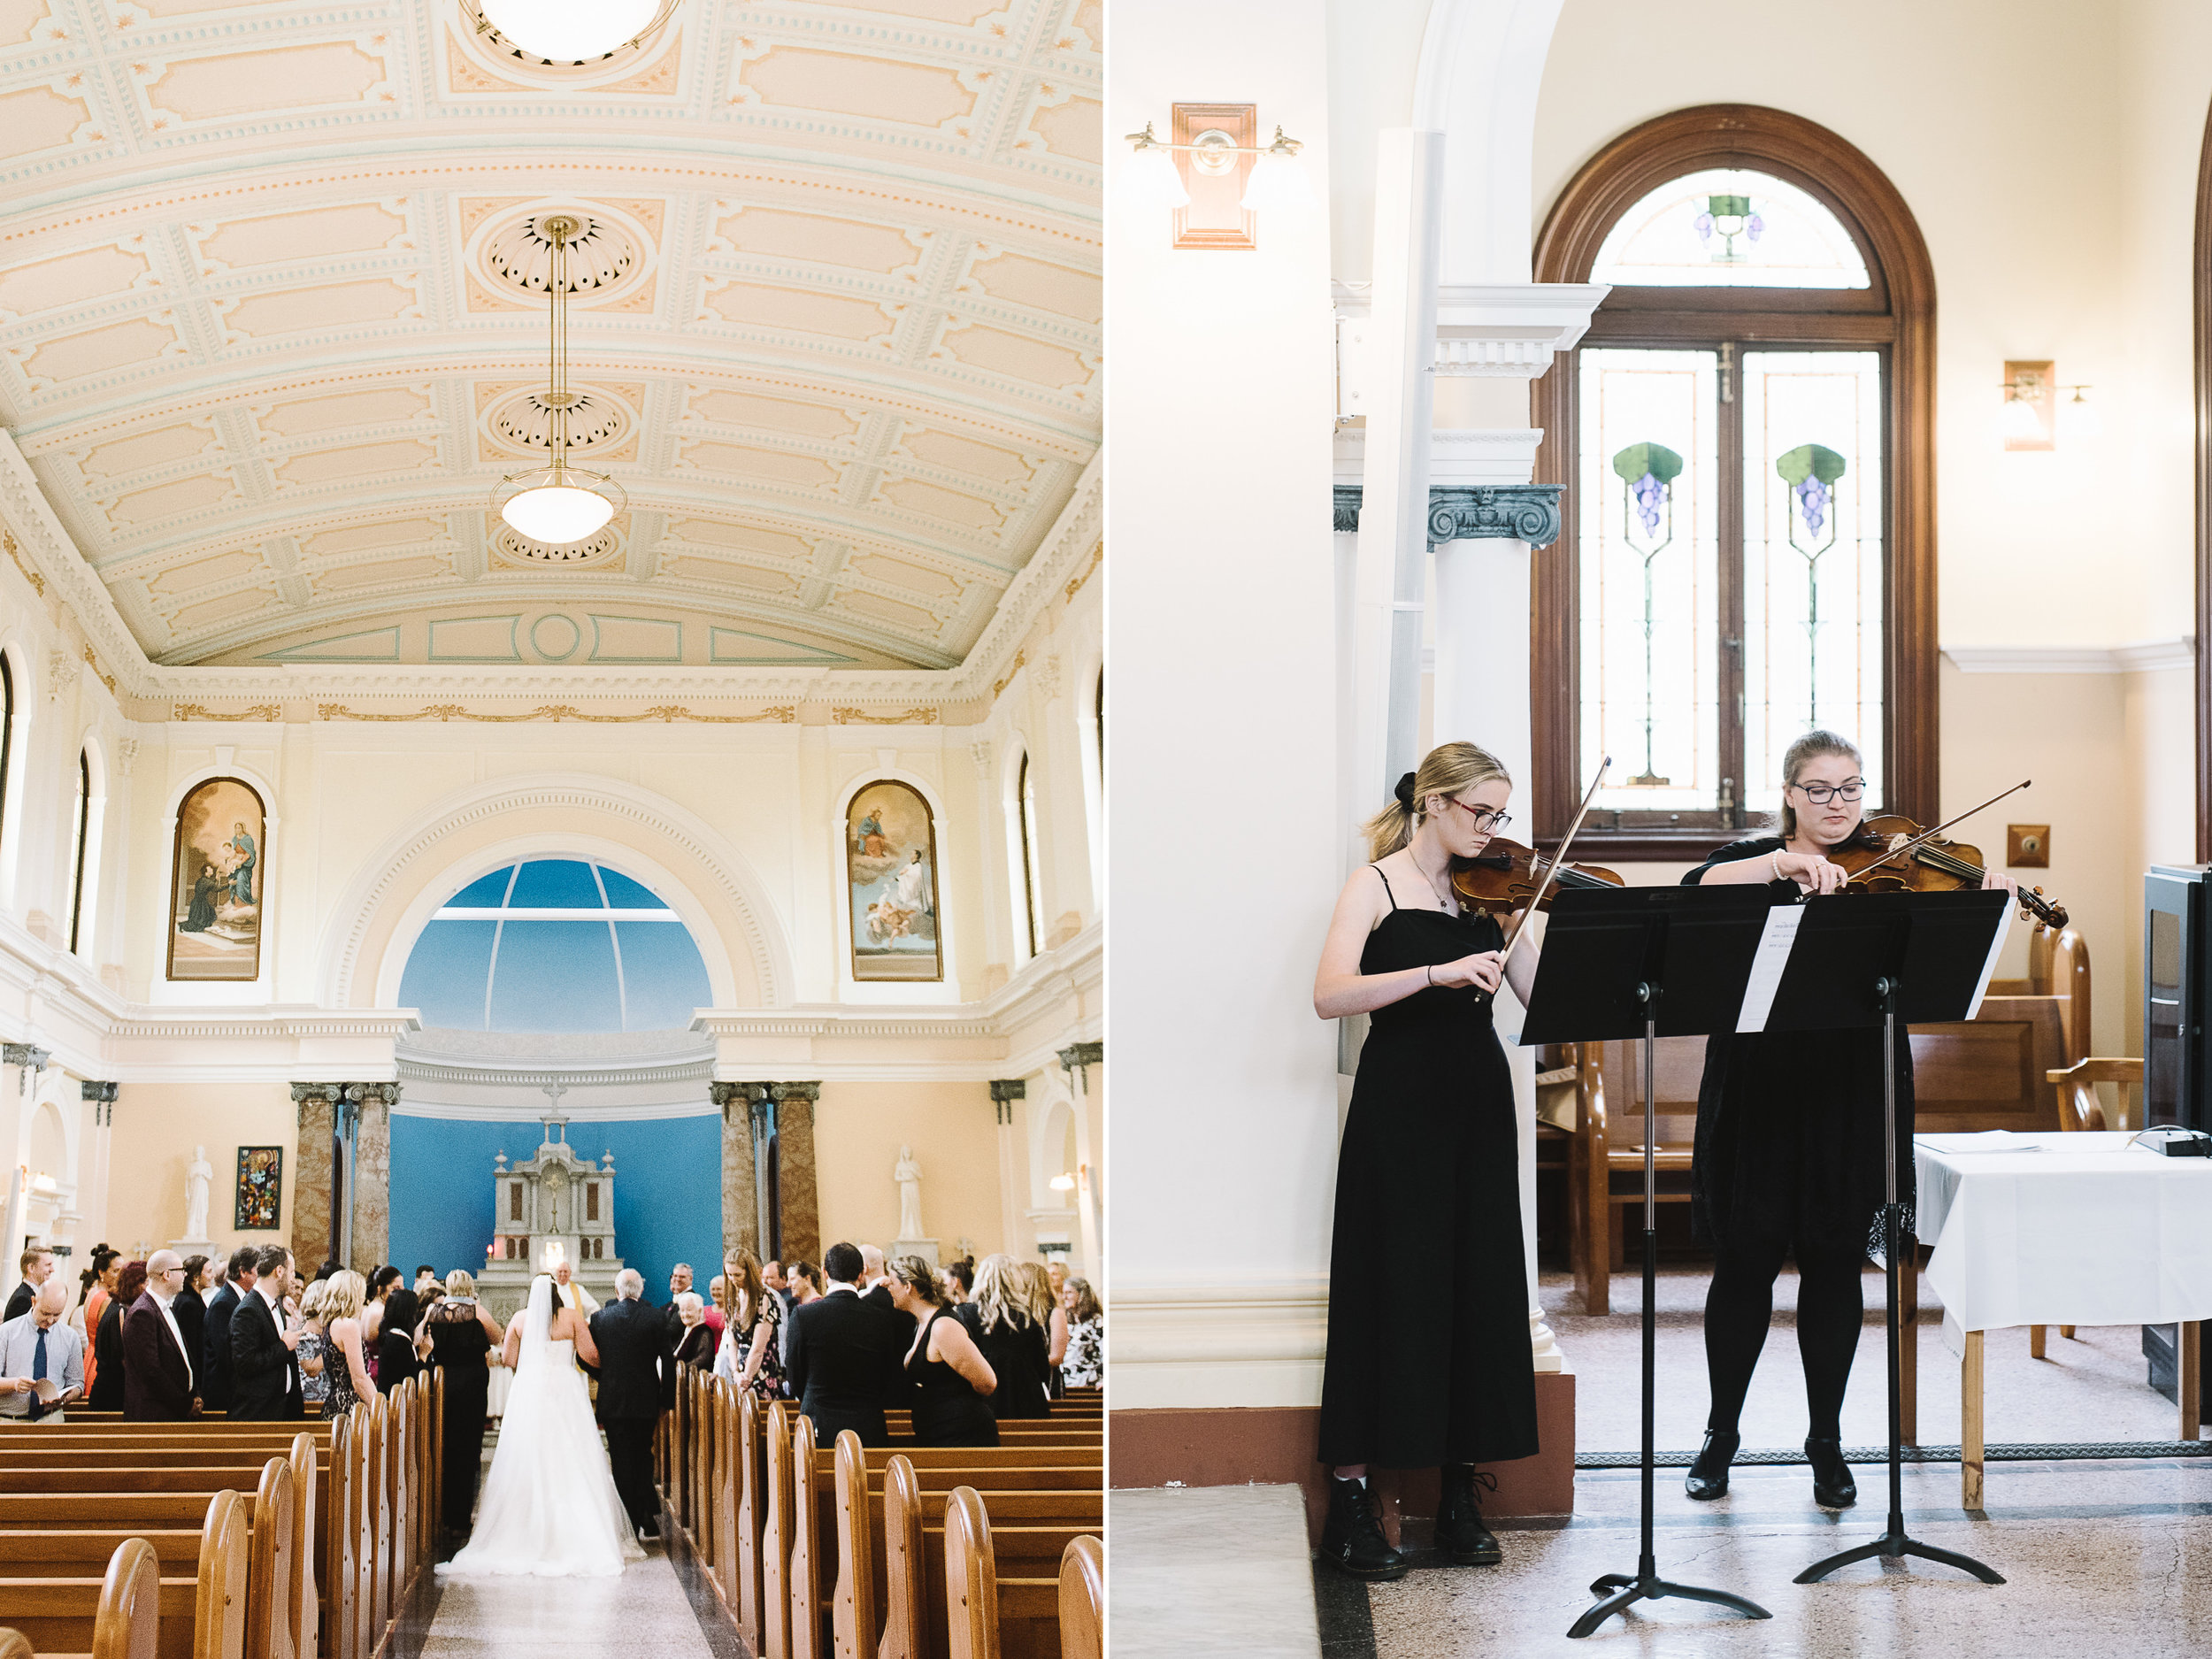 nudgee-college-wedding-23.jpg